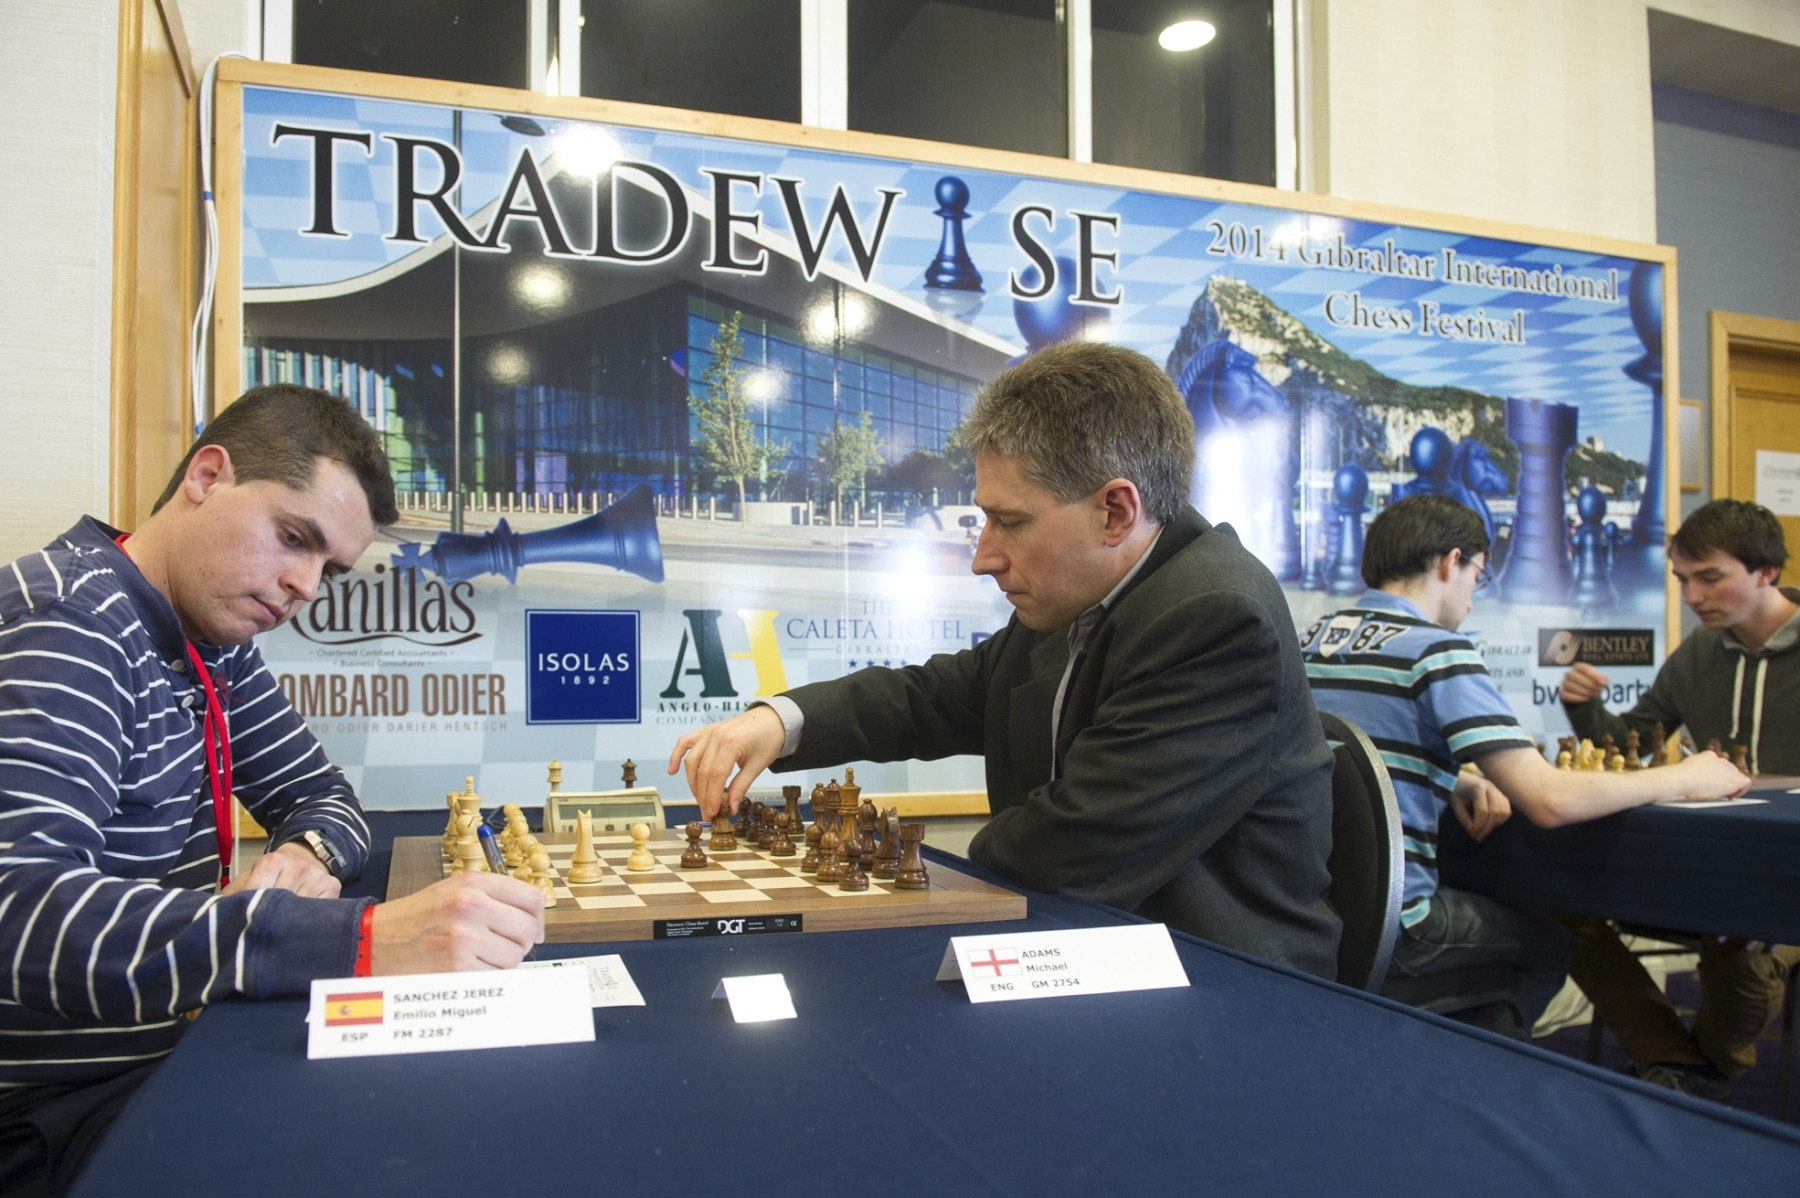 gibraltar-tradewise-chess-festival_006_12193593703_o